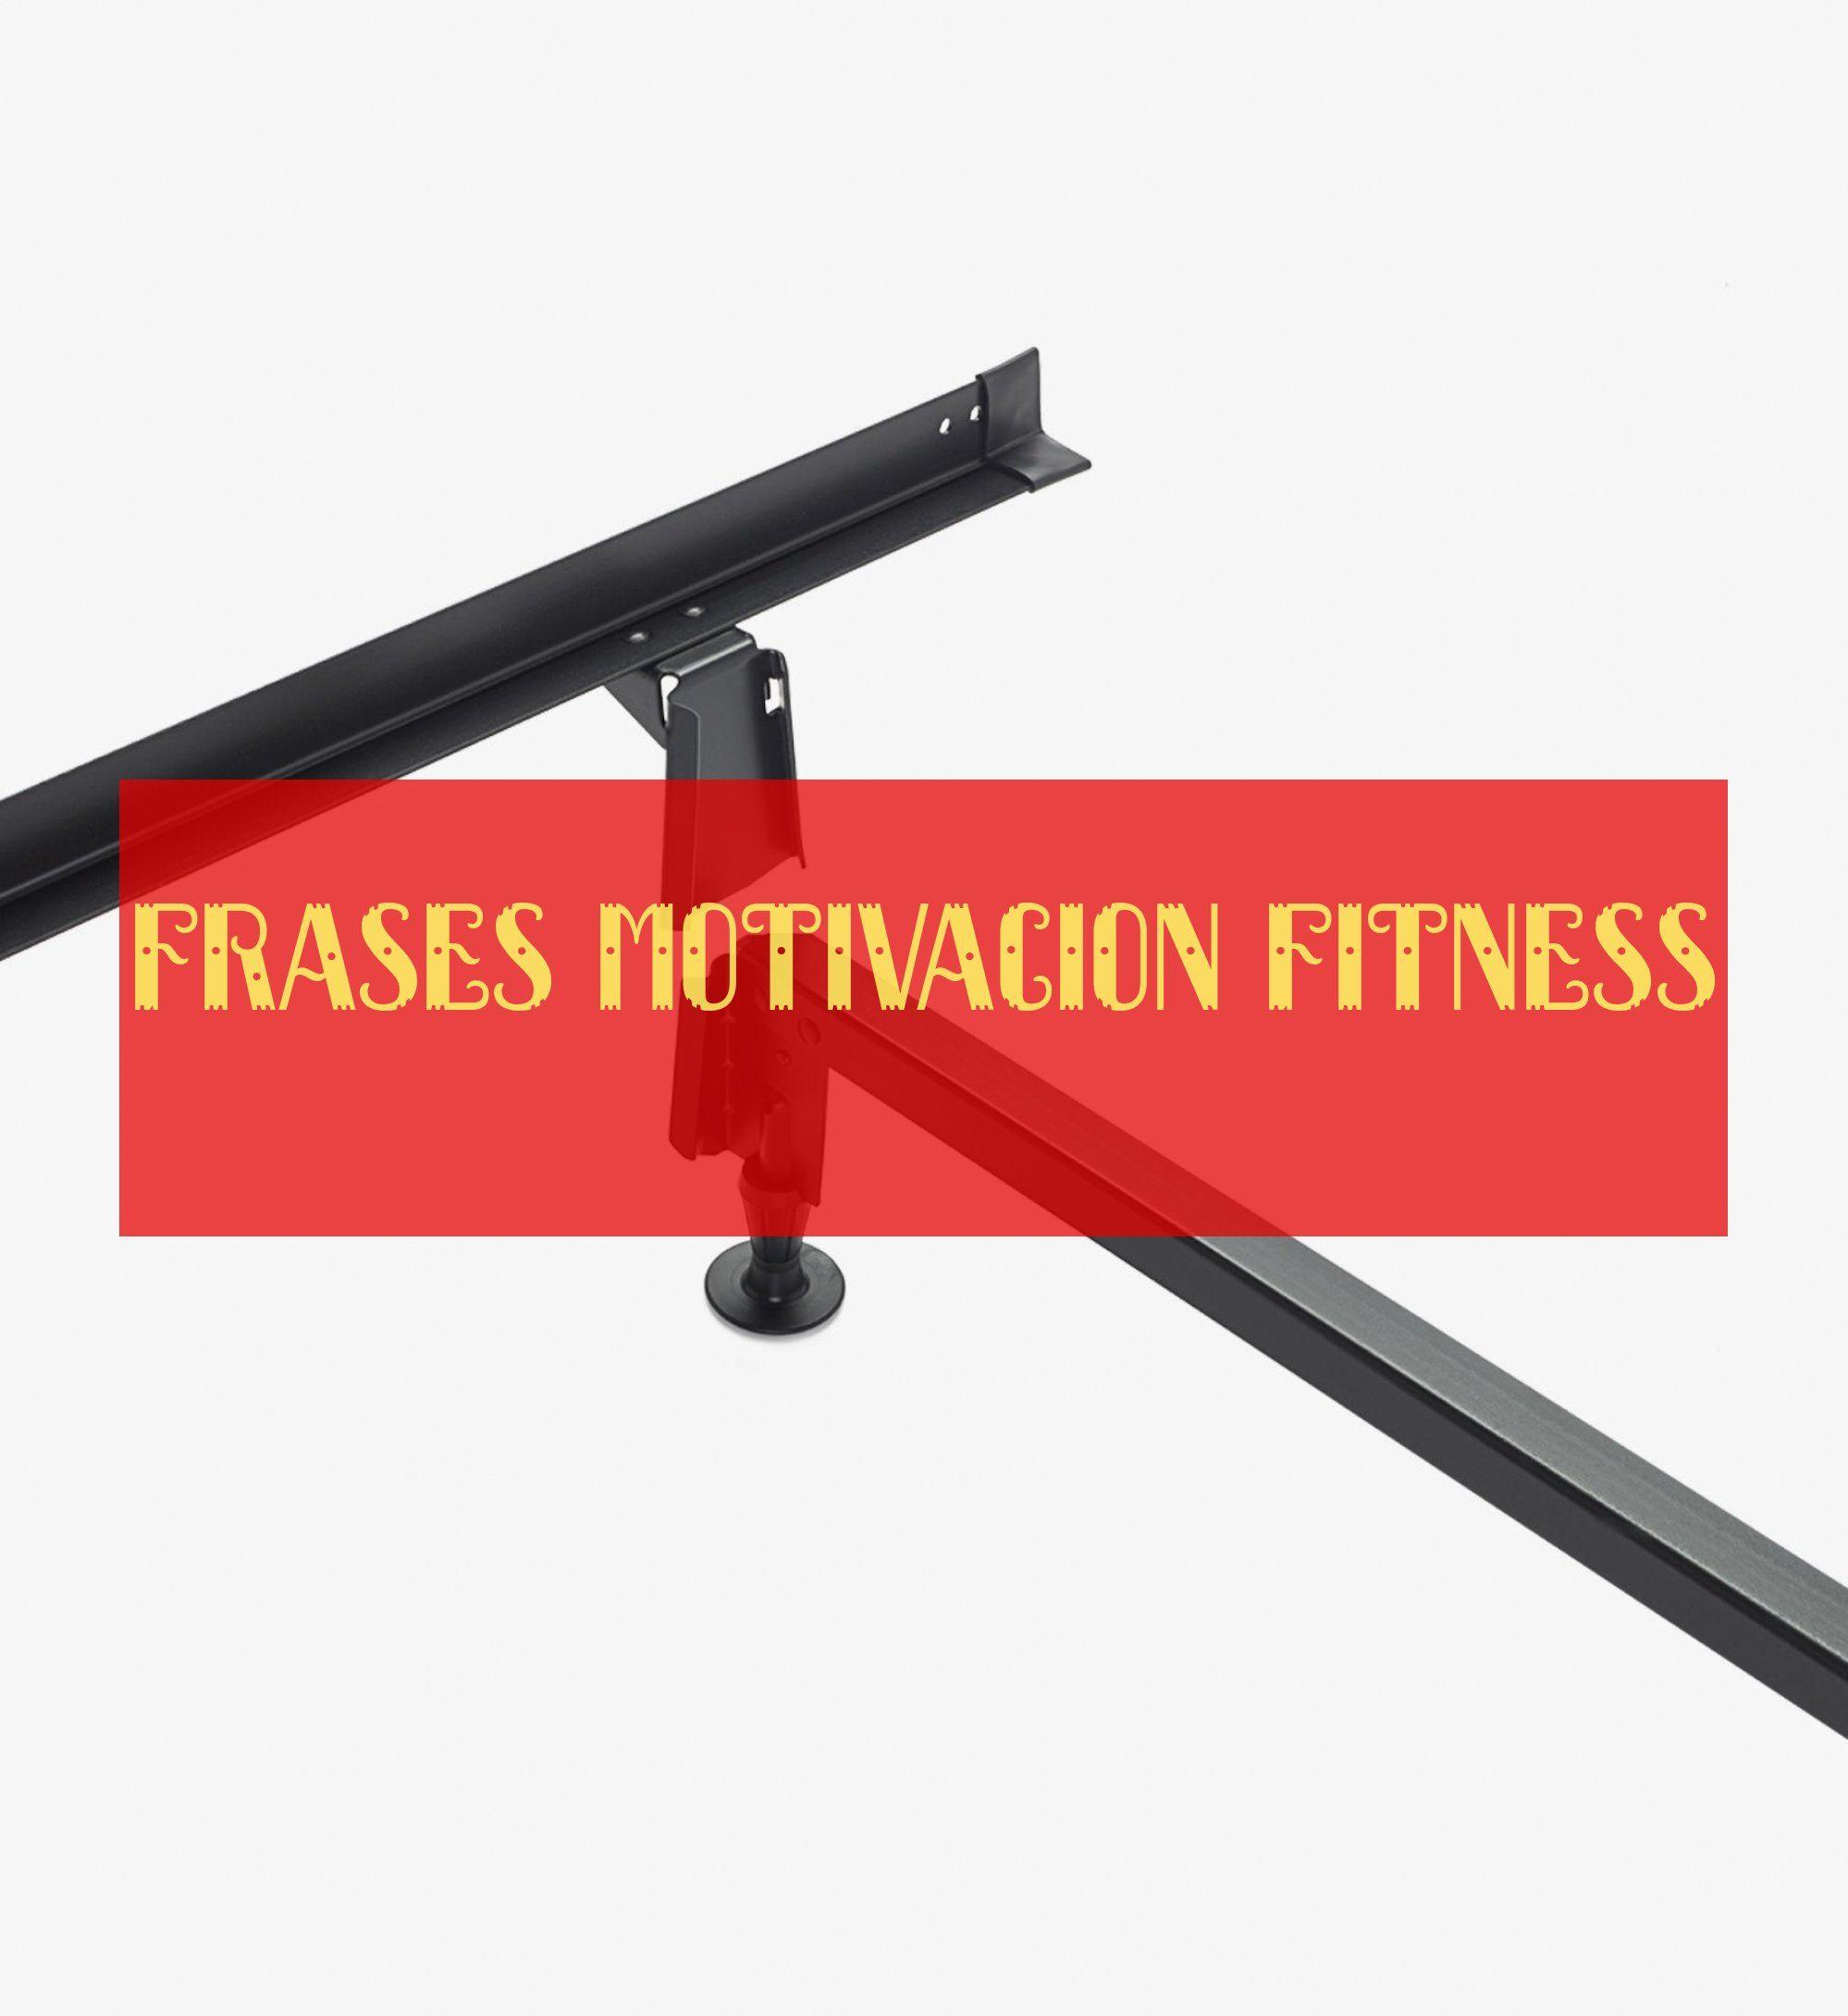 frases motivacion fitness #frases #motivacion #fitness